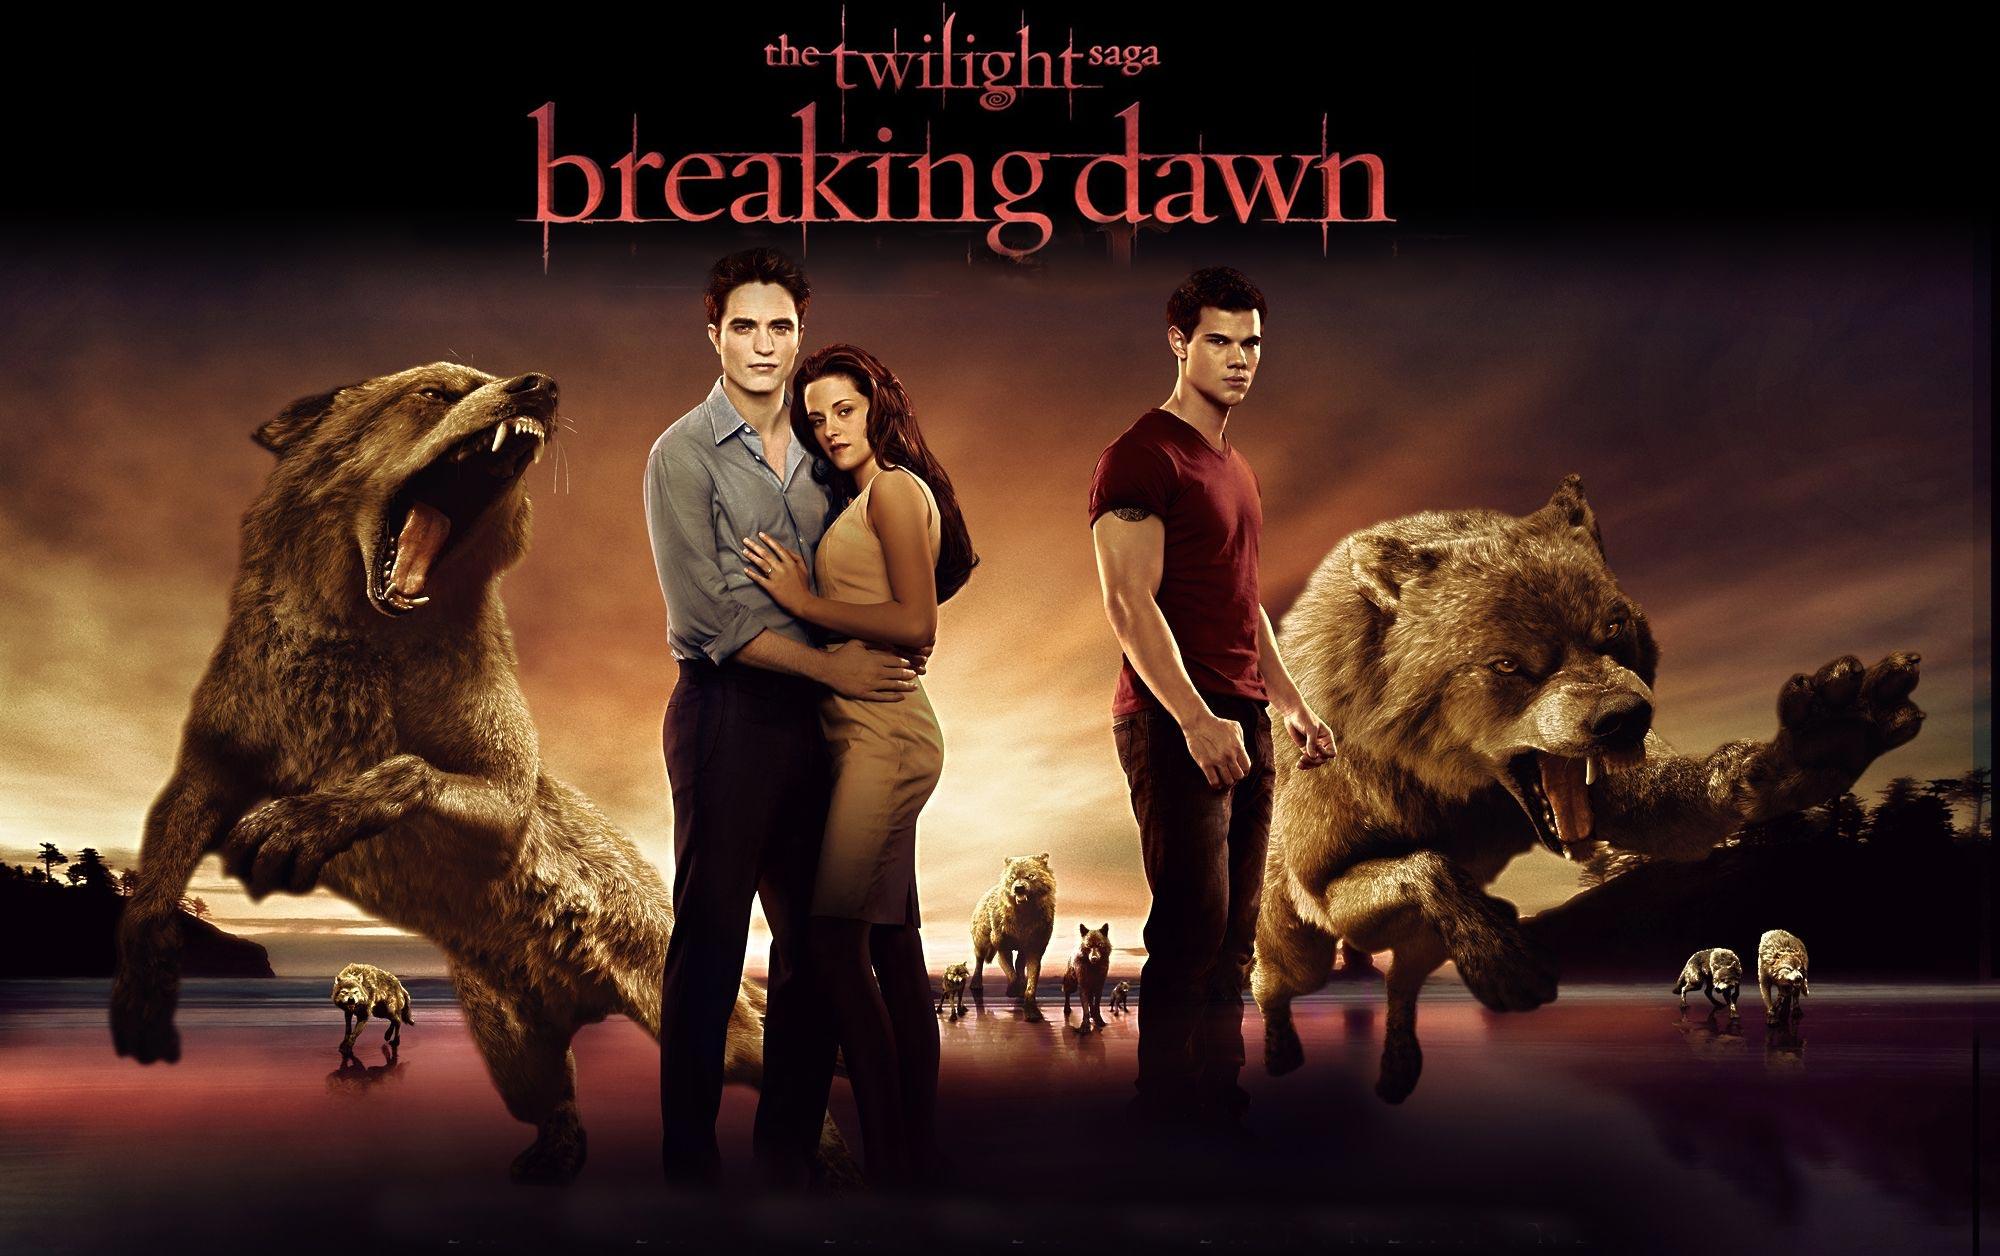 The Twilight Saga: Breaking Dawn – Part 1 opens tonight and I'm